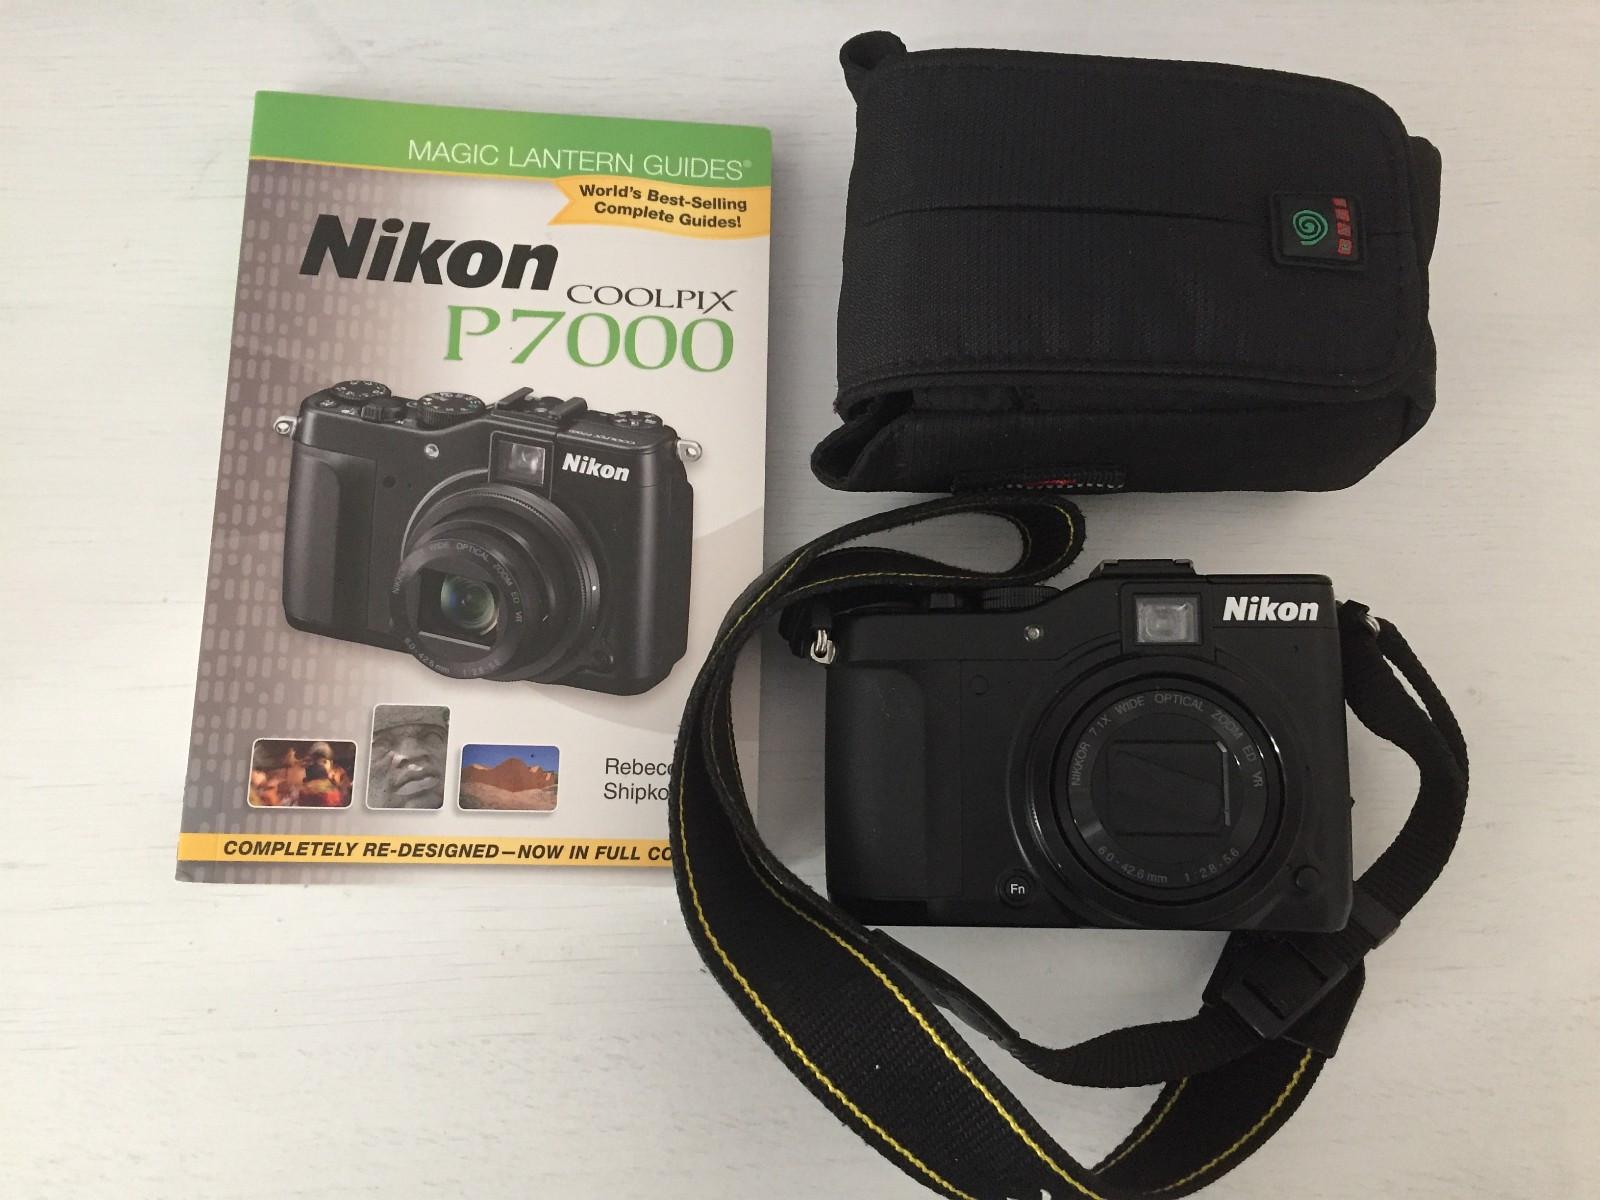 Nikon Coolpix P7000 selges   FINN.no